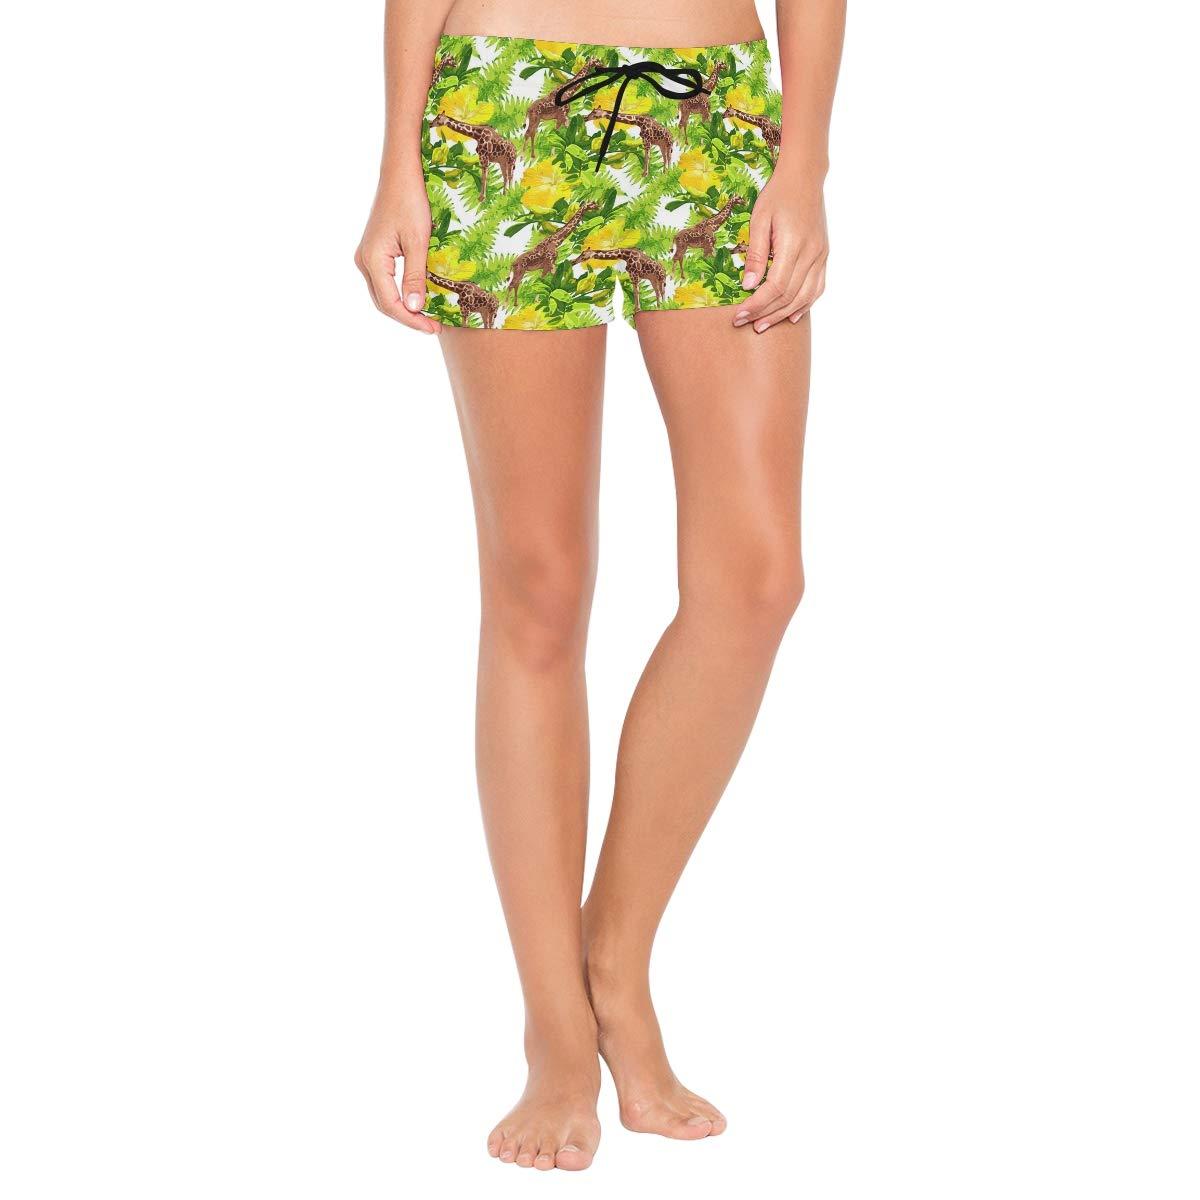 Giraffes Tropic Pattern Lttedeng Womens Swim Trunks 3D Printed Beach Board Shorts with Pockets for Teen Girls